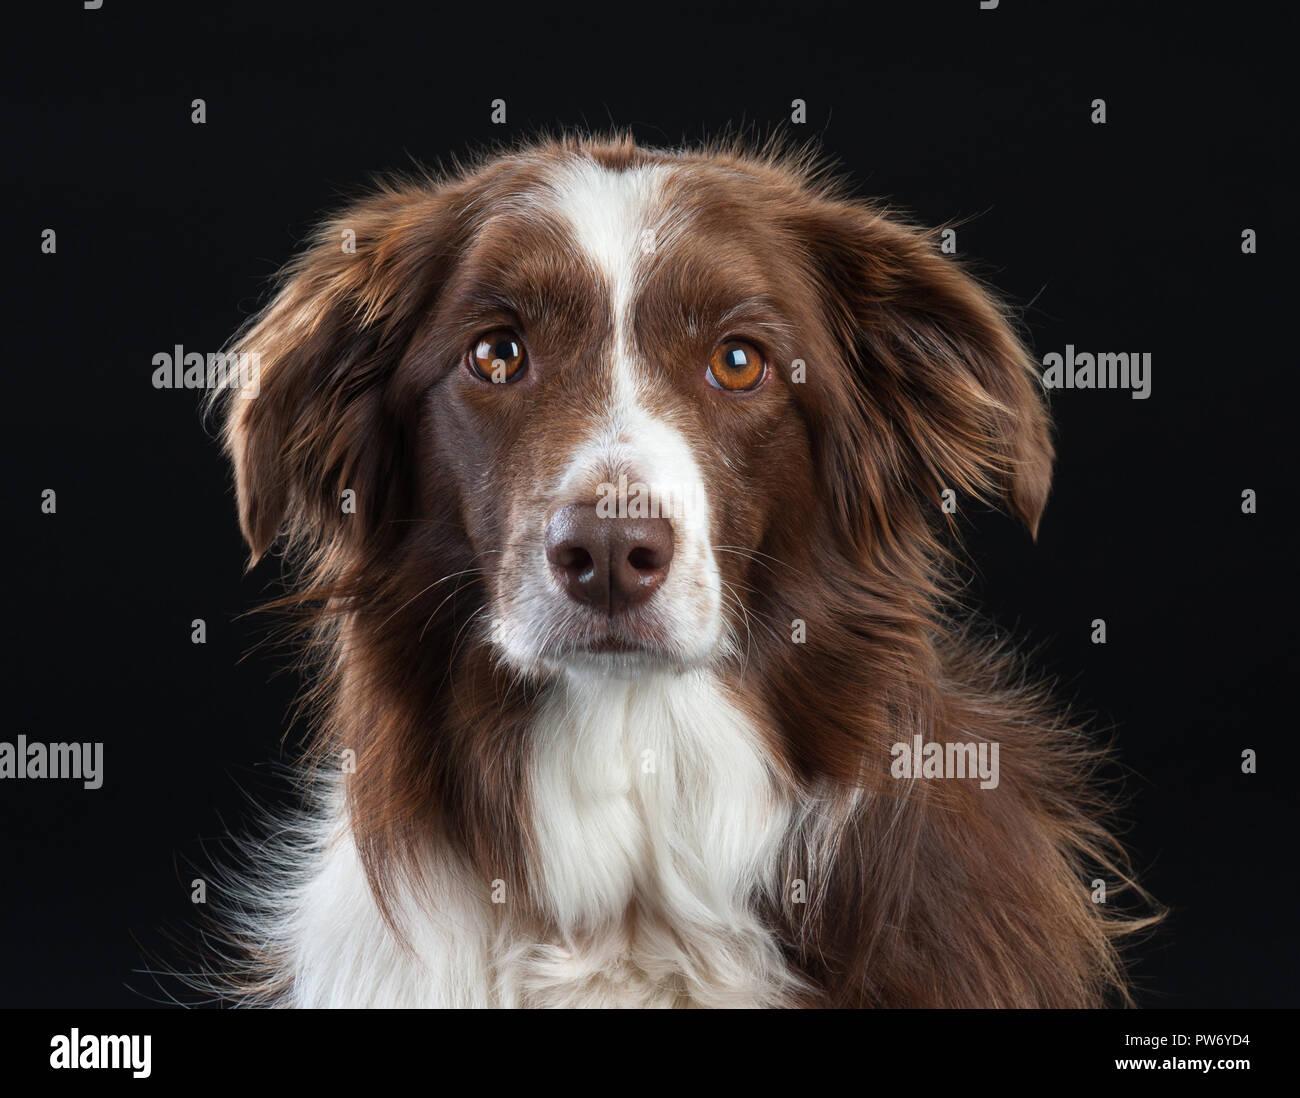 Cross Breed Studio Portrait of Dog with Black Background - Stock Image